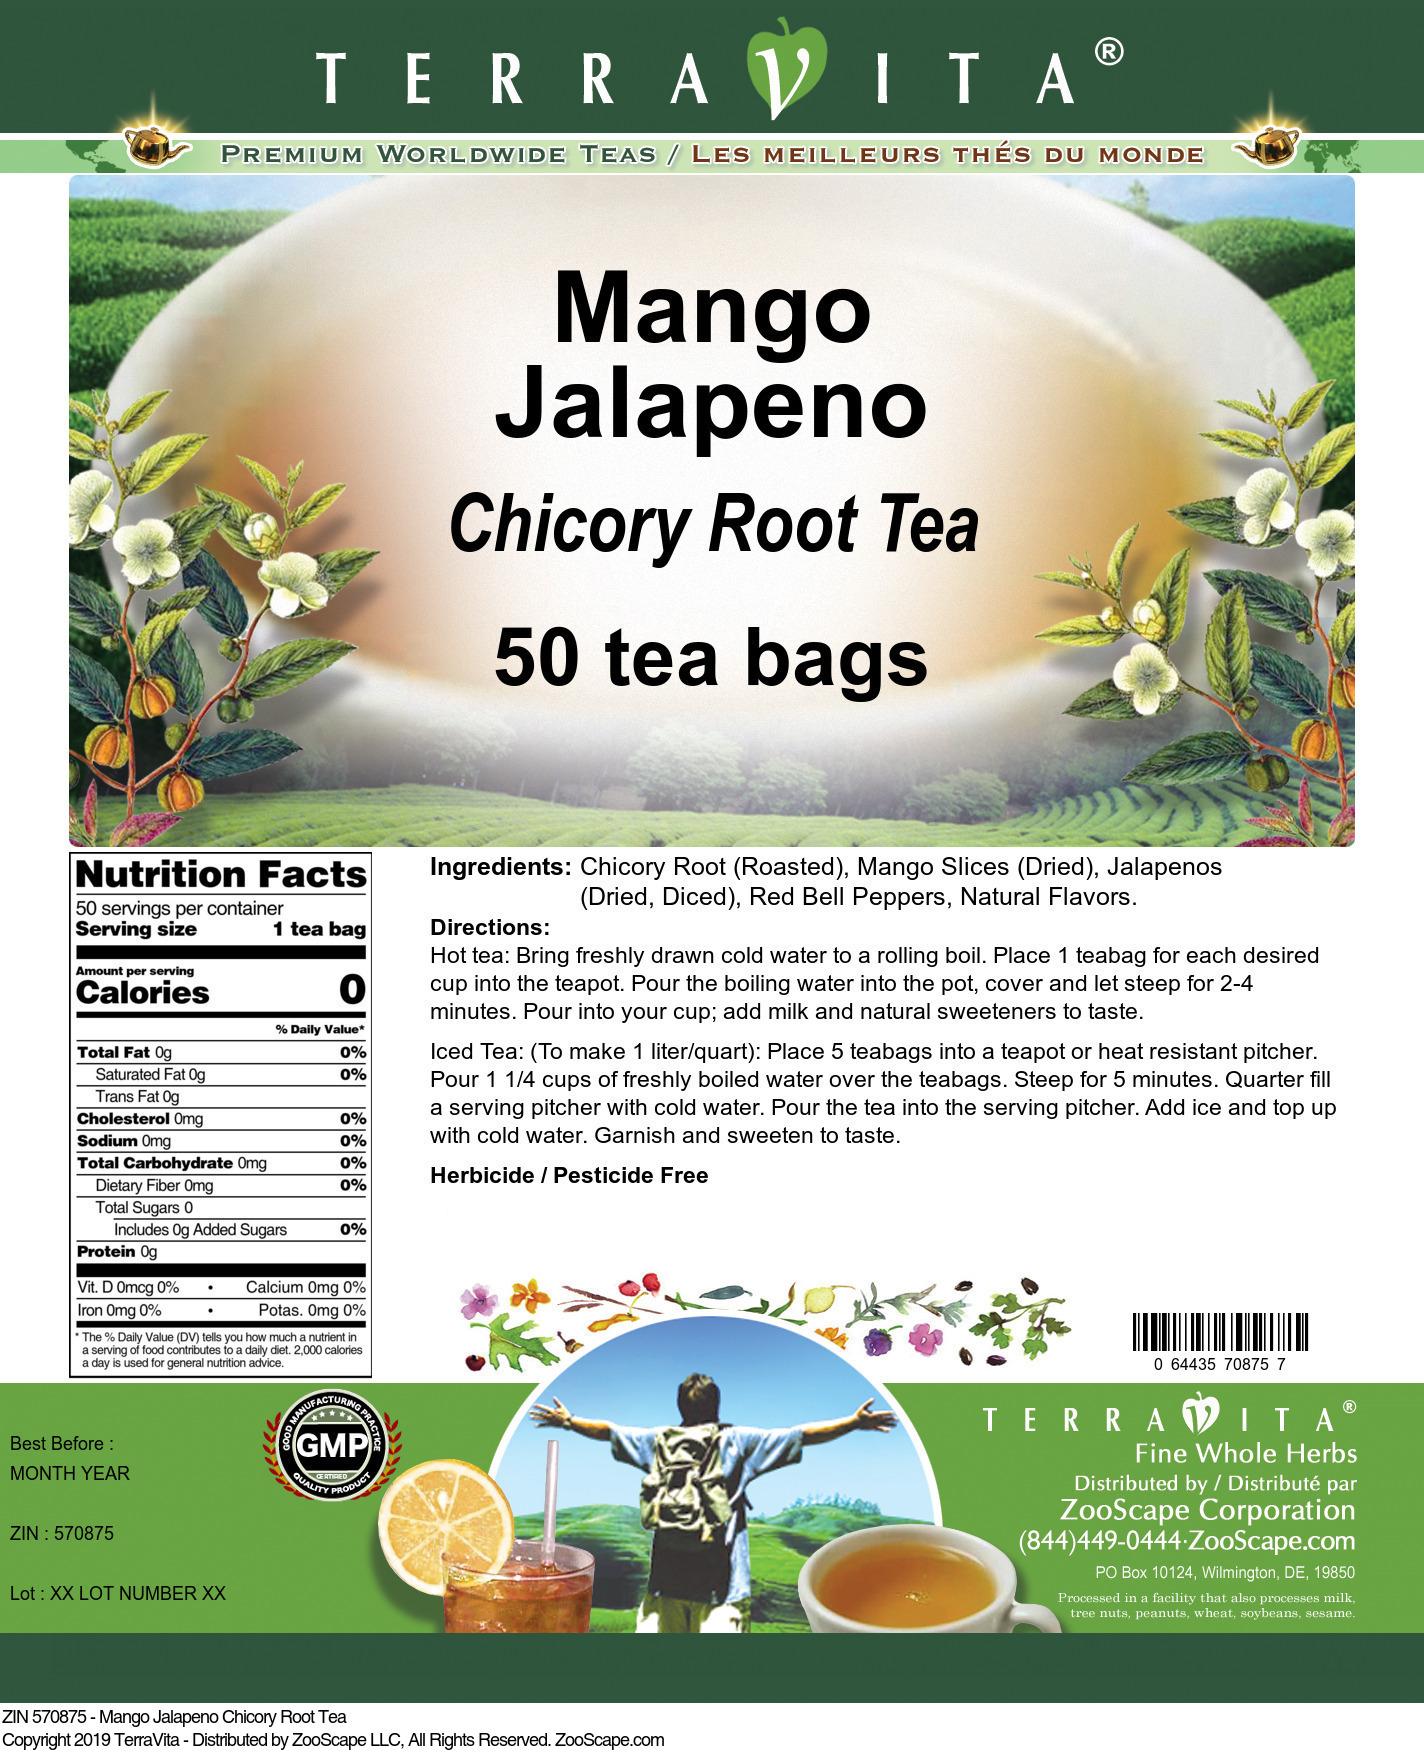 Mango Jalapeno Chicory Root